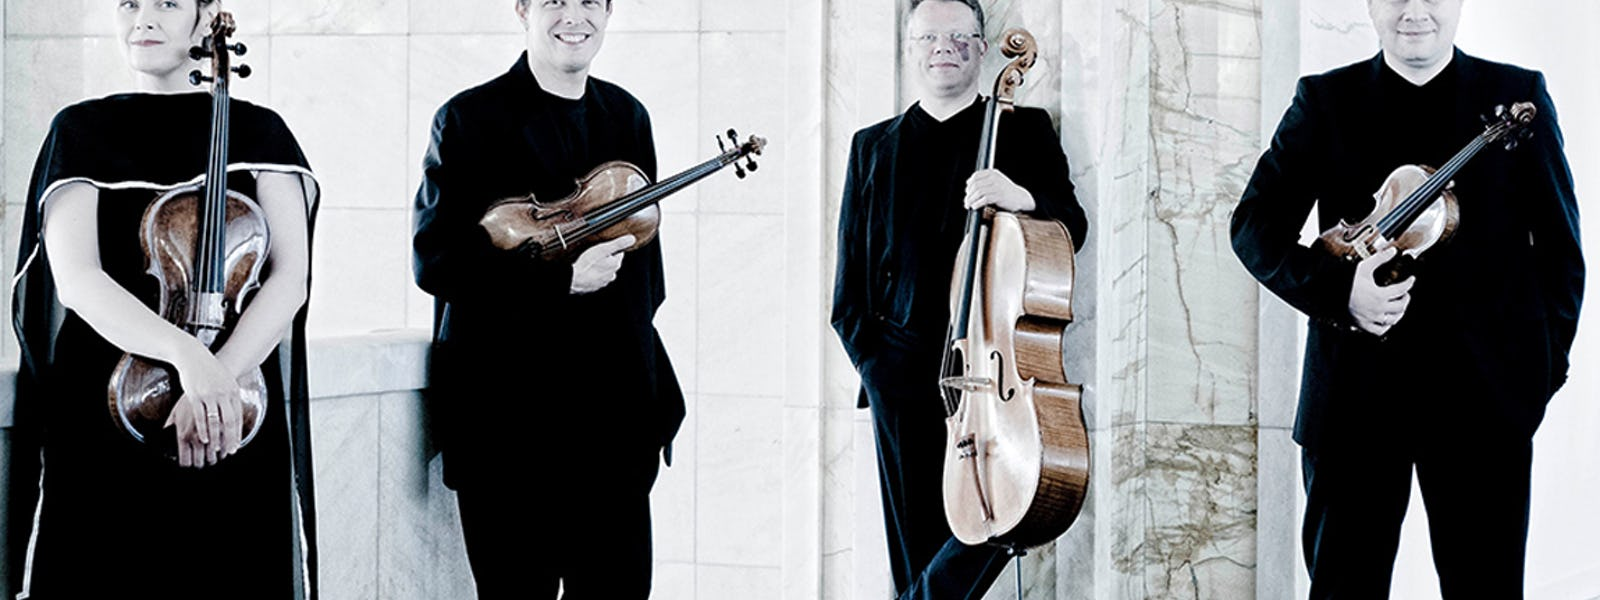 Bild - Henschel Quartett